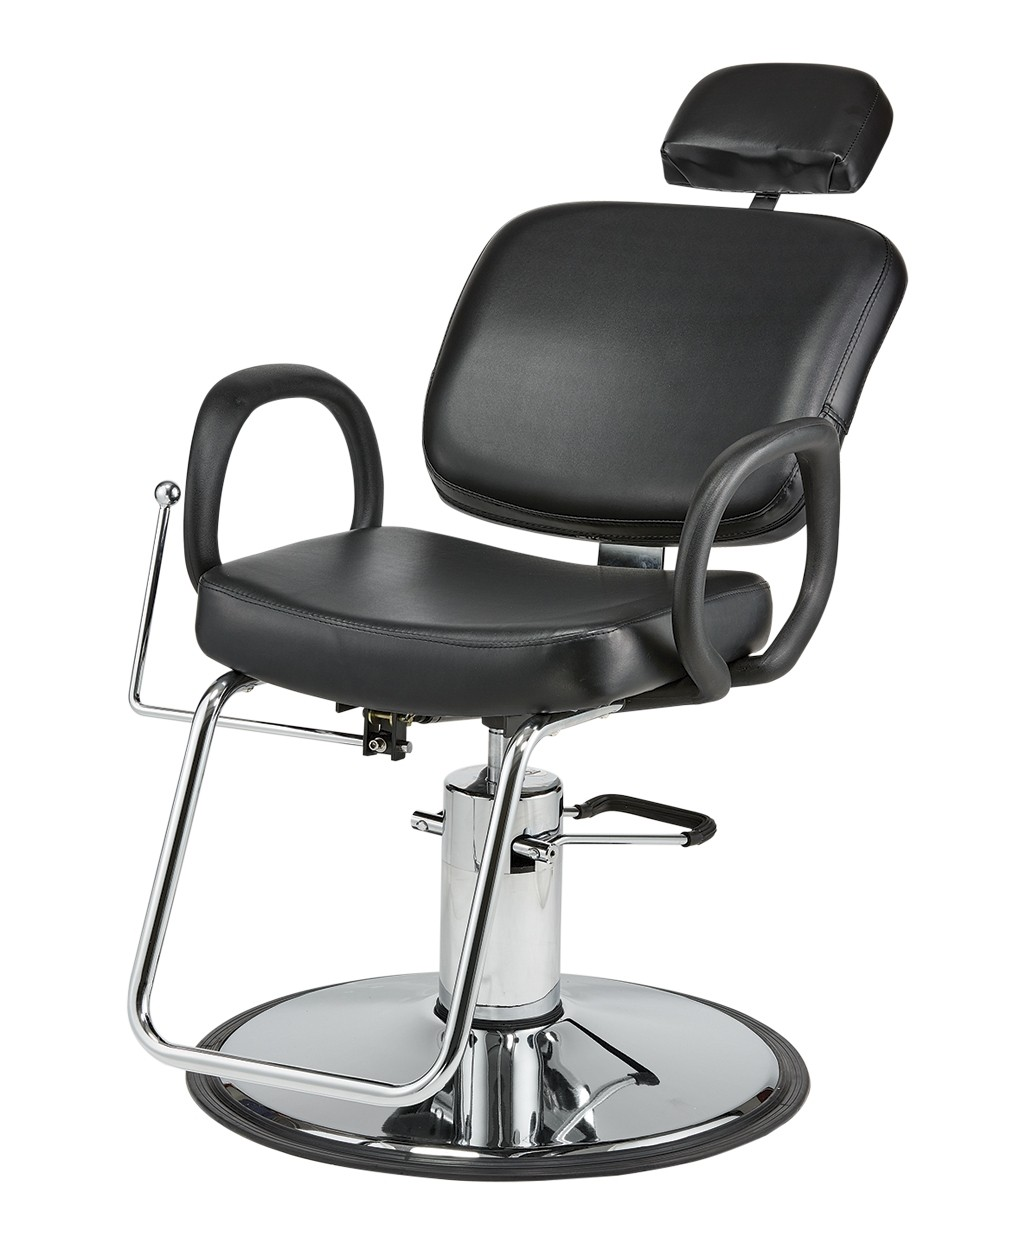 Pibbs 5447 Loop Threading Chair